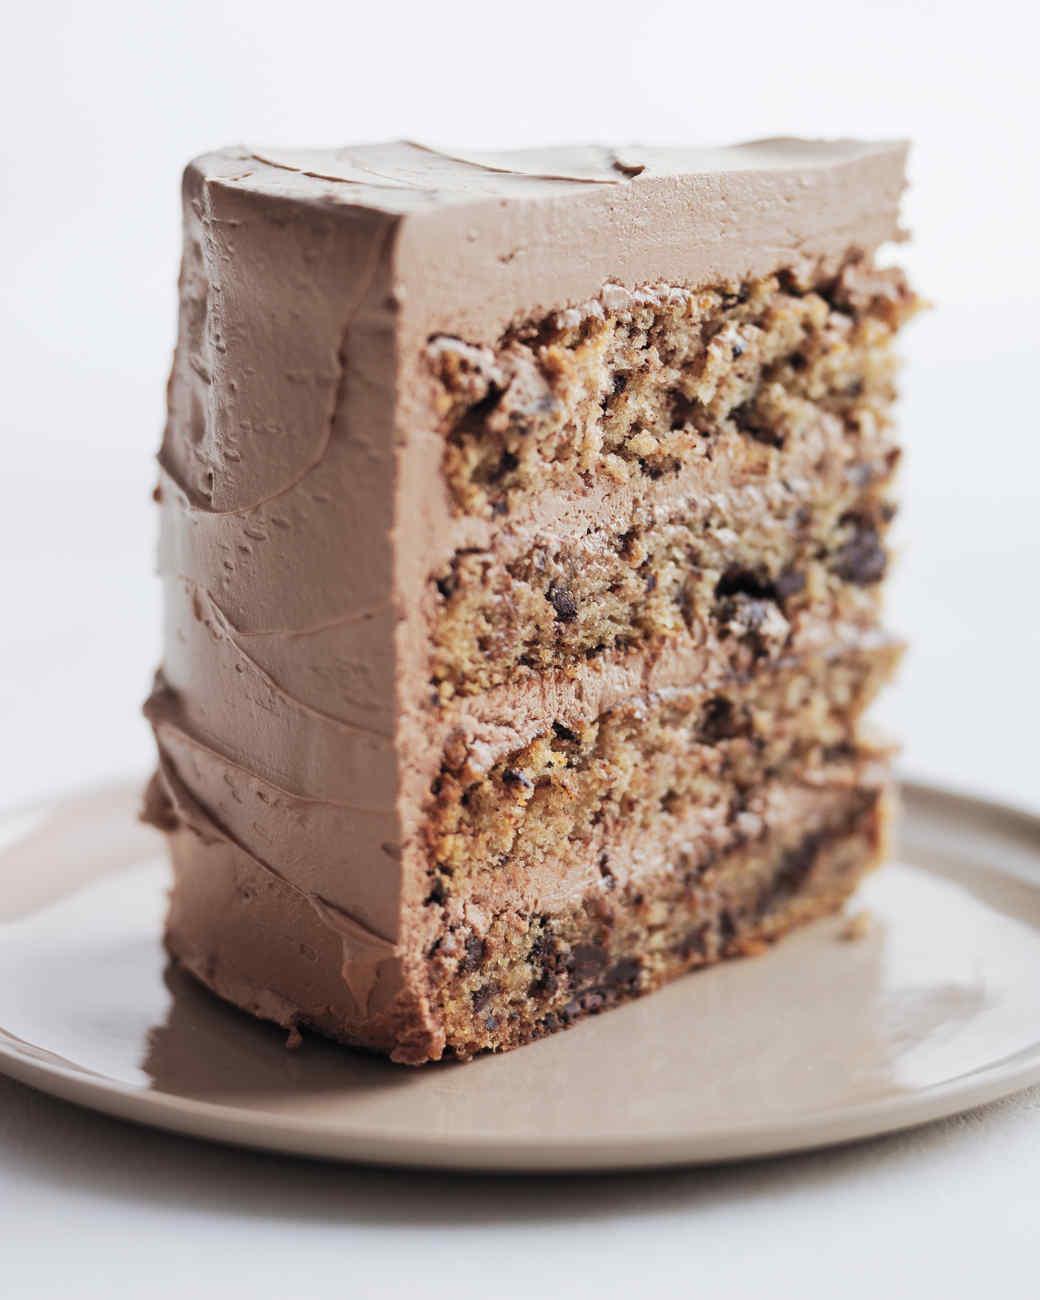 chocolate-flecked-layer-cake-slice-md109612.jpg